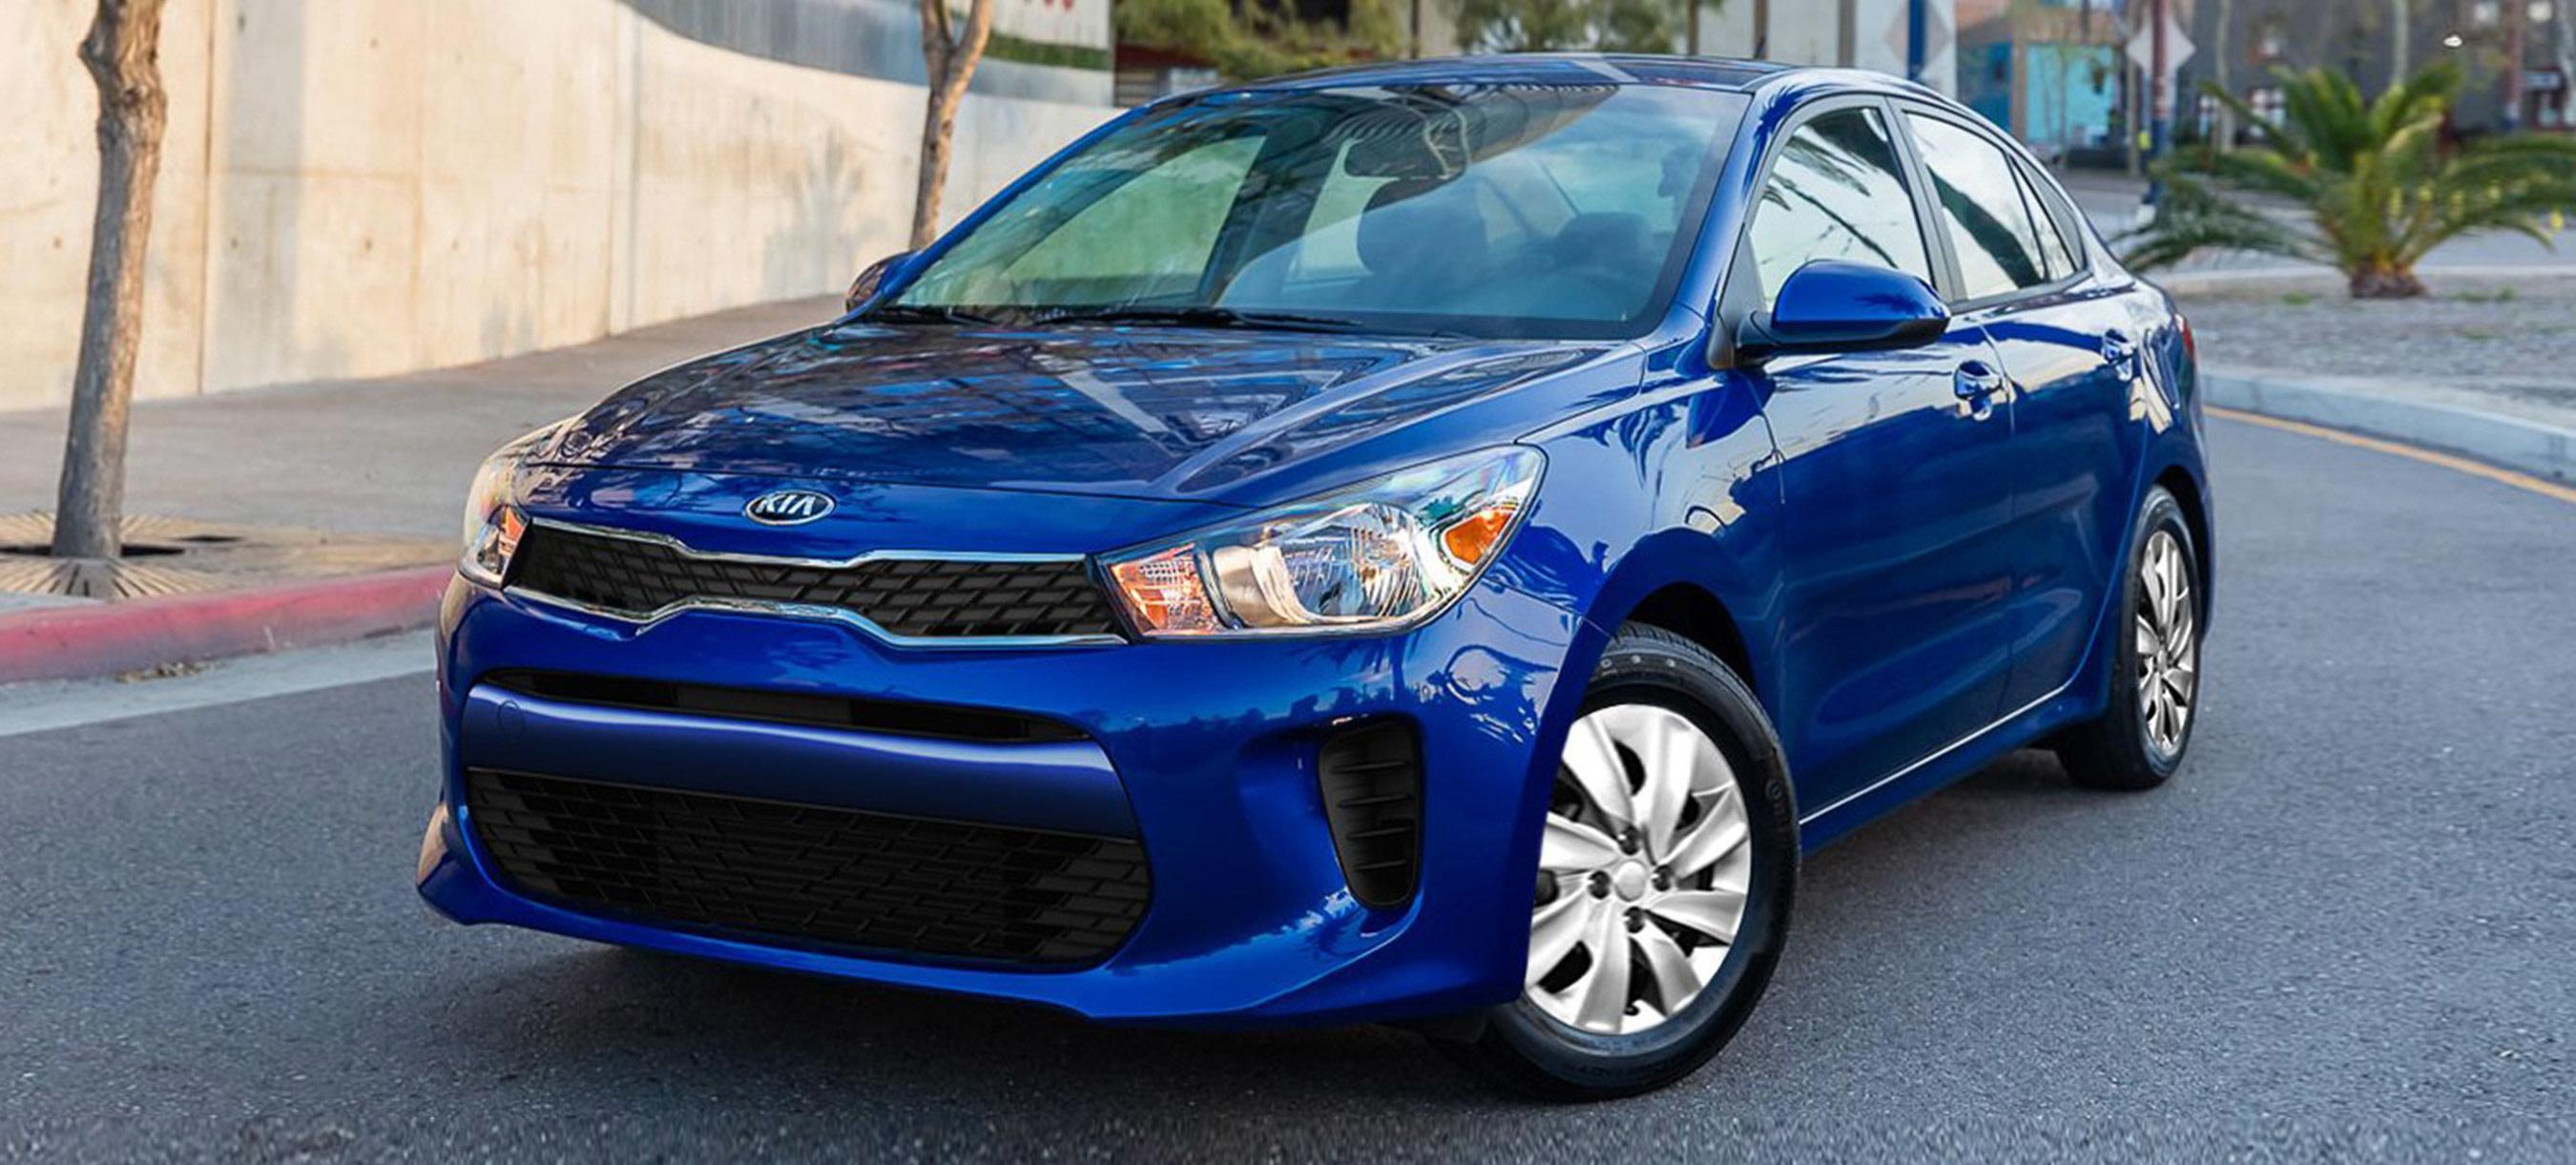 2020 Kia Rio for Sale near Baytown, TX